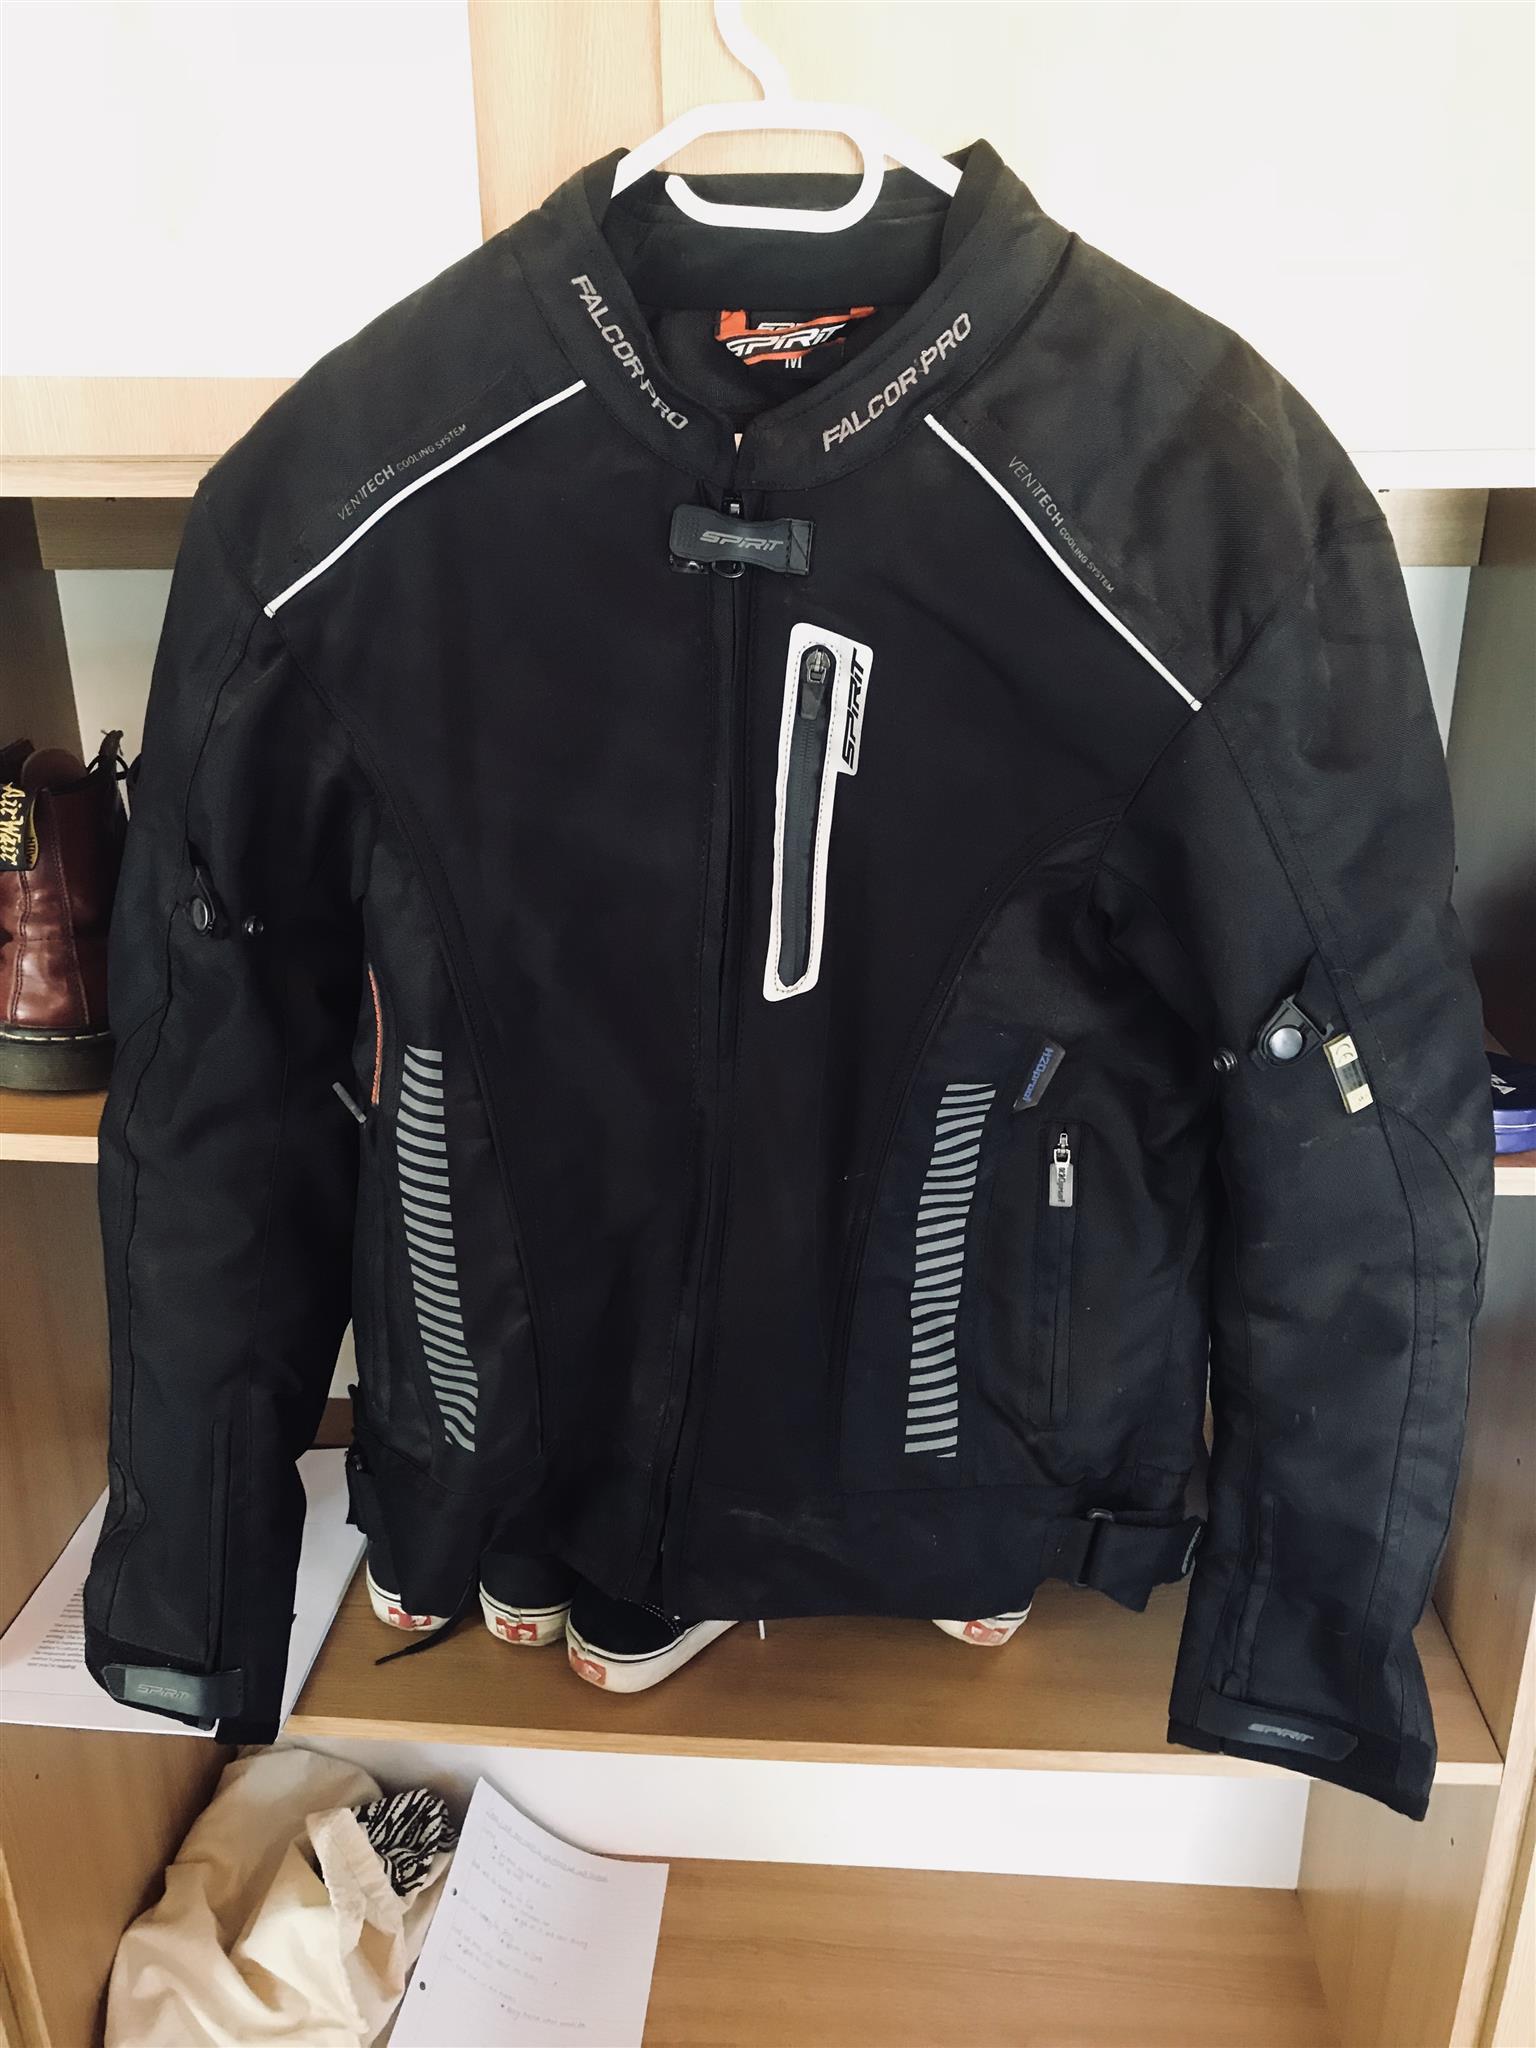 Spirit Helmet, jacket and gloves